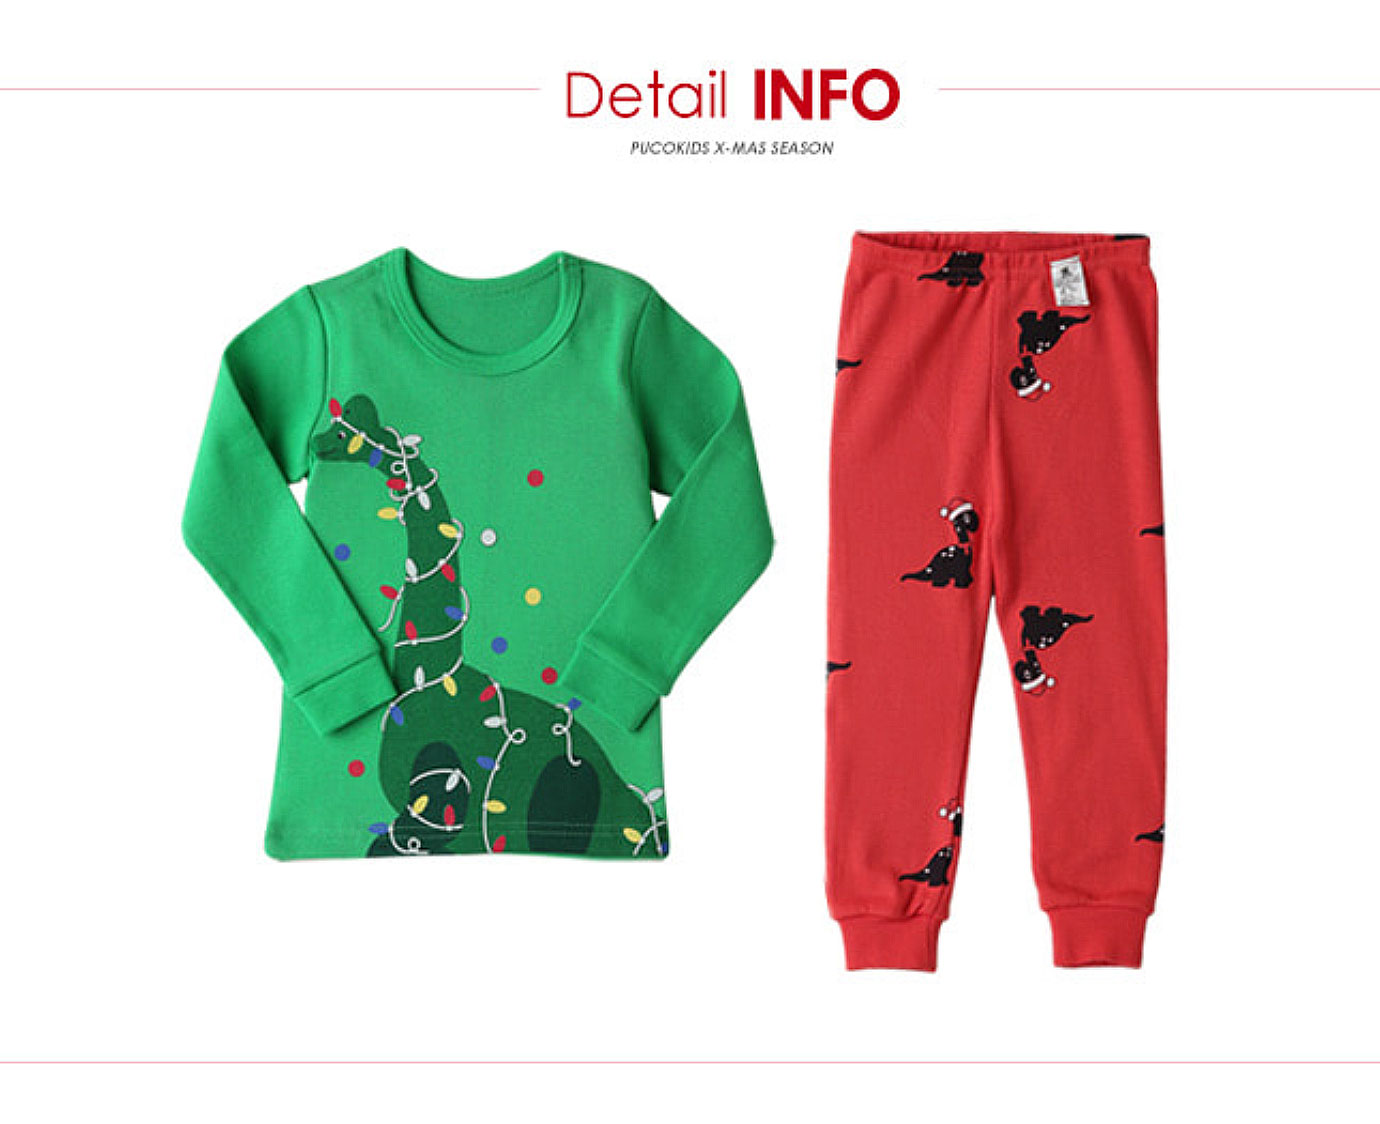 Pyjama 'Tree Saurus' Organic